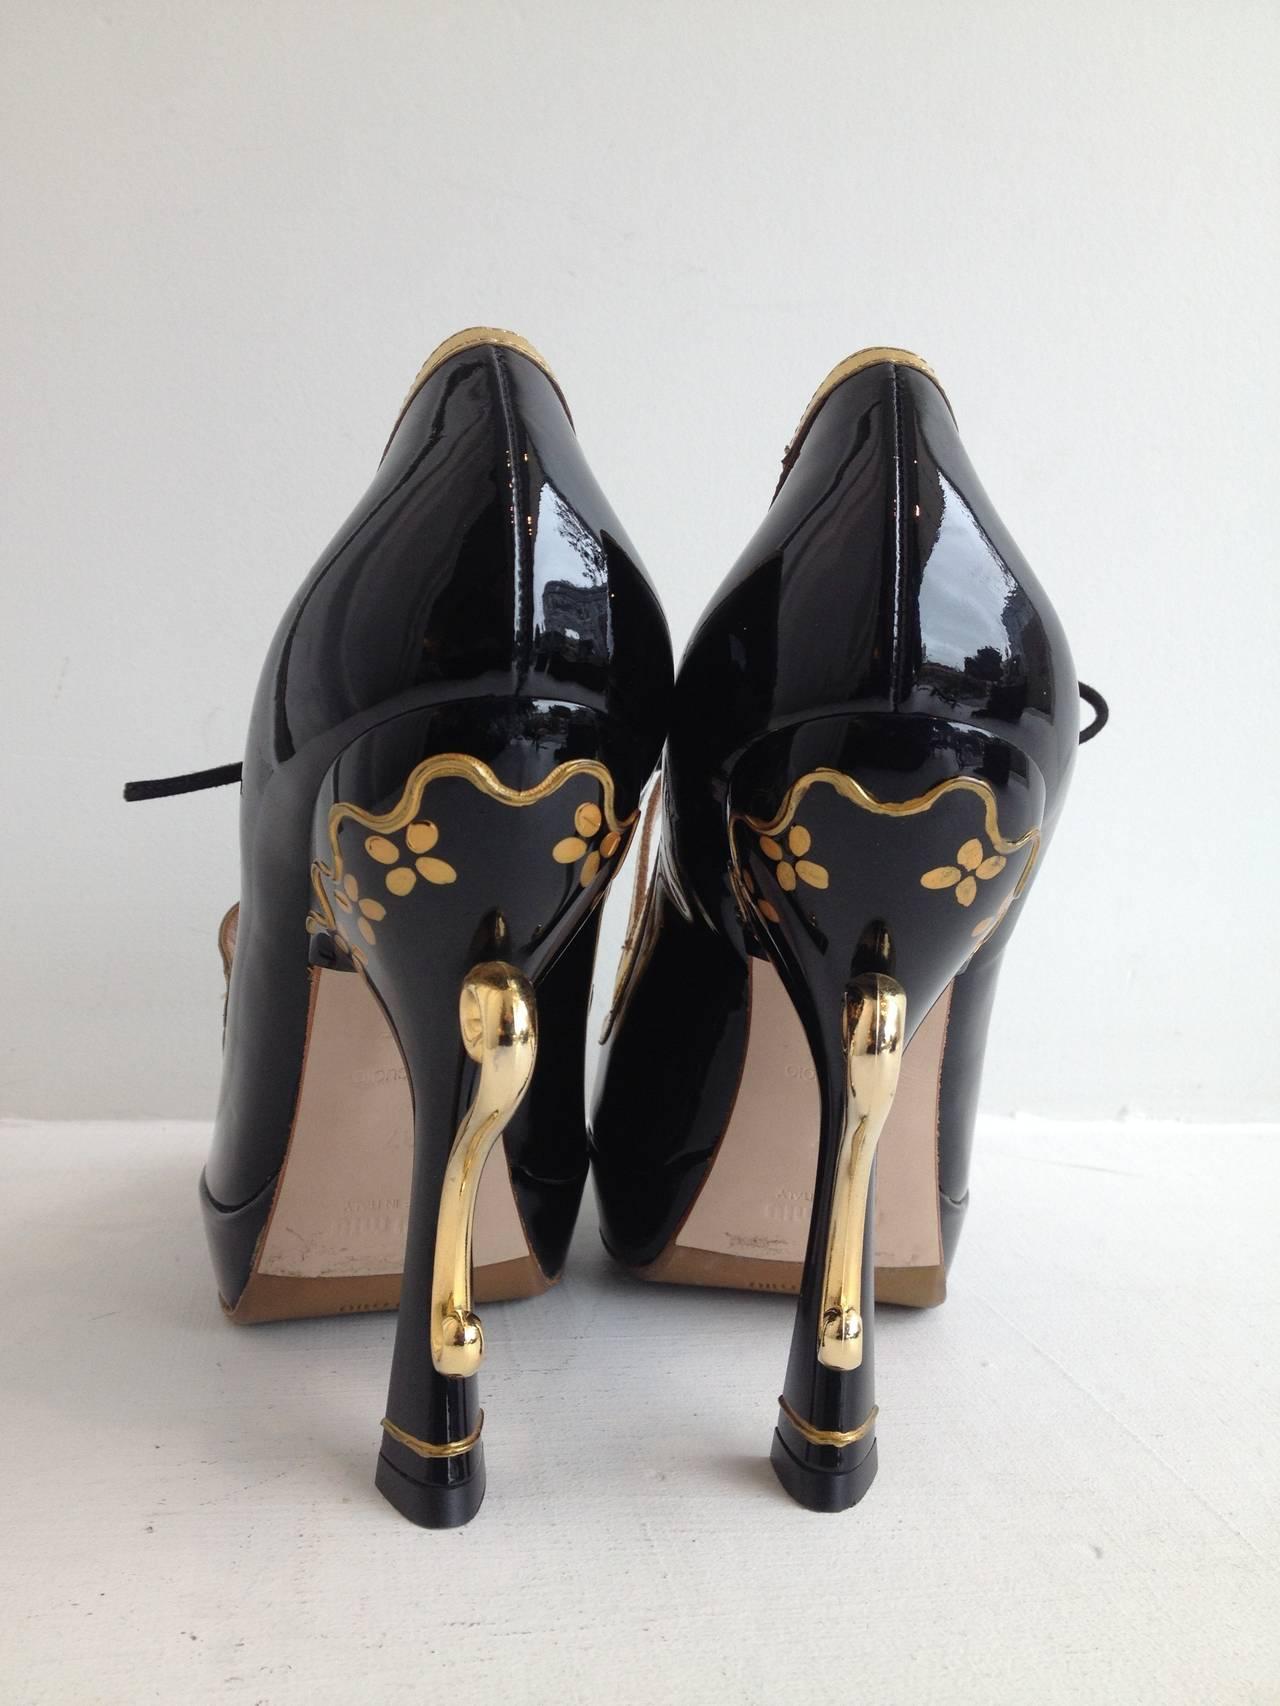 Miu Miu Black Patent Teacup Heels 3